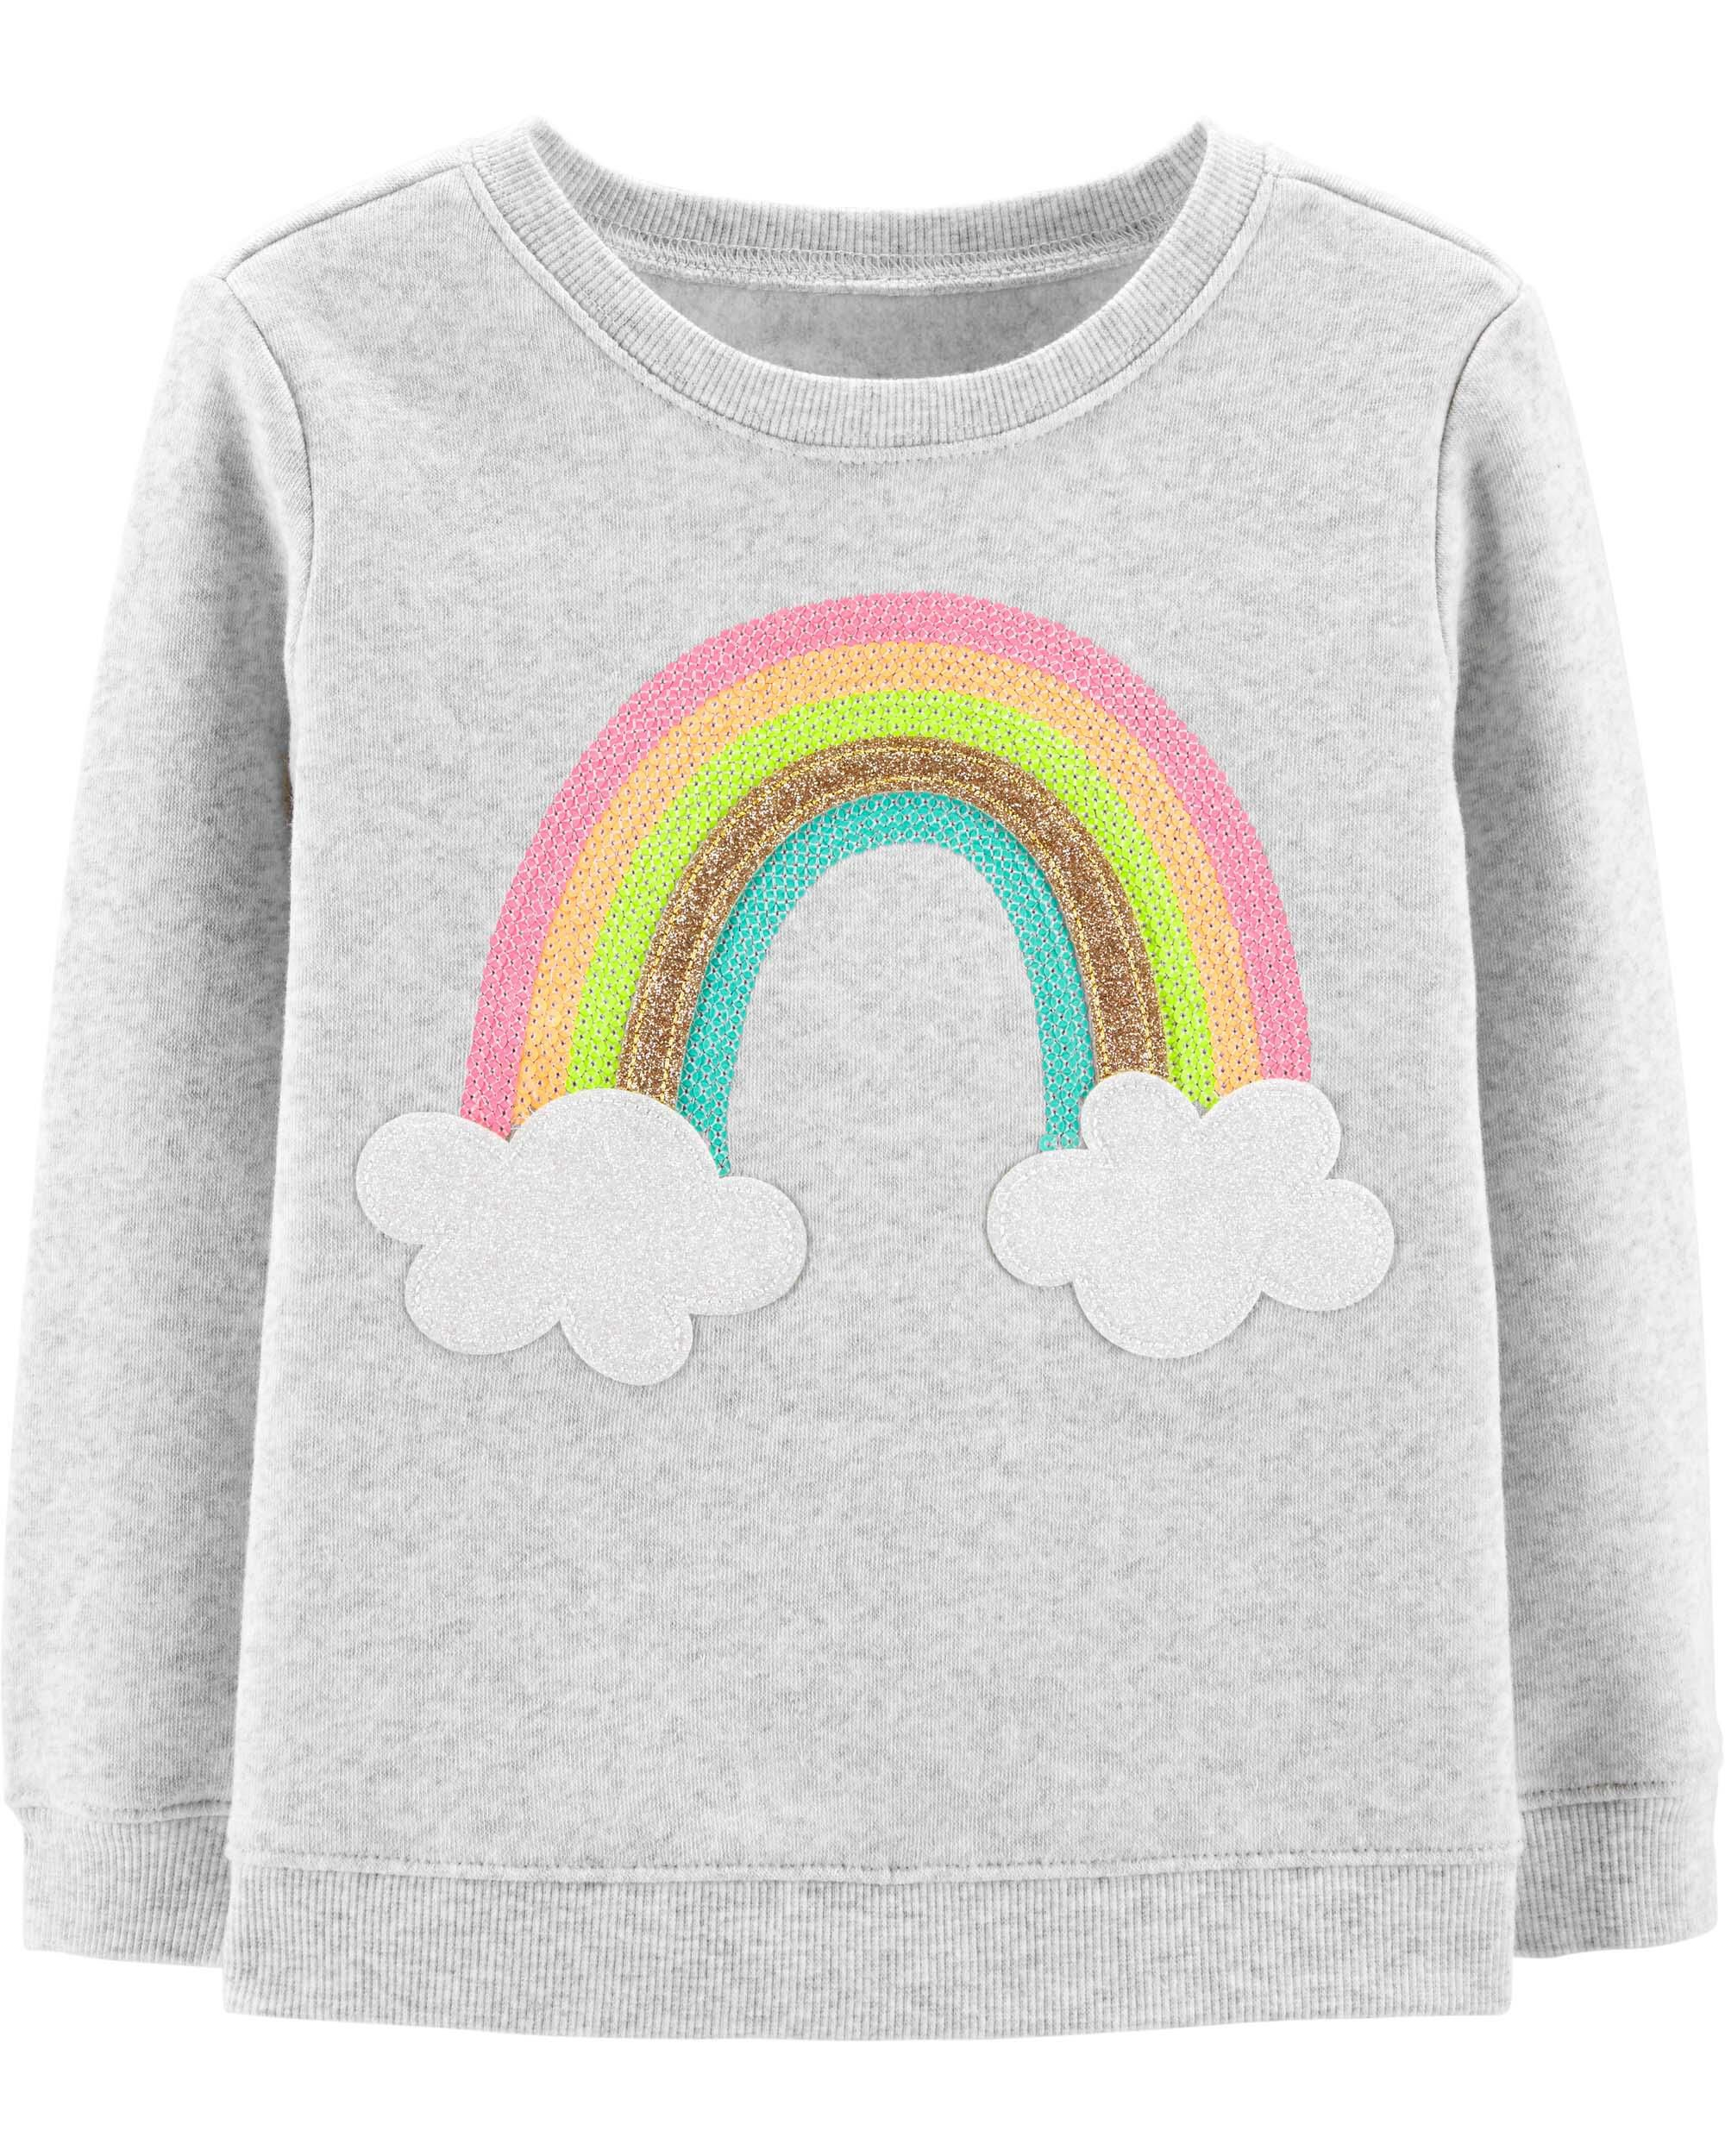 09cdd5af2847 Toddler Girl Glitter Rainbow Pullover